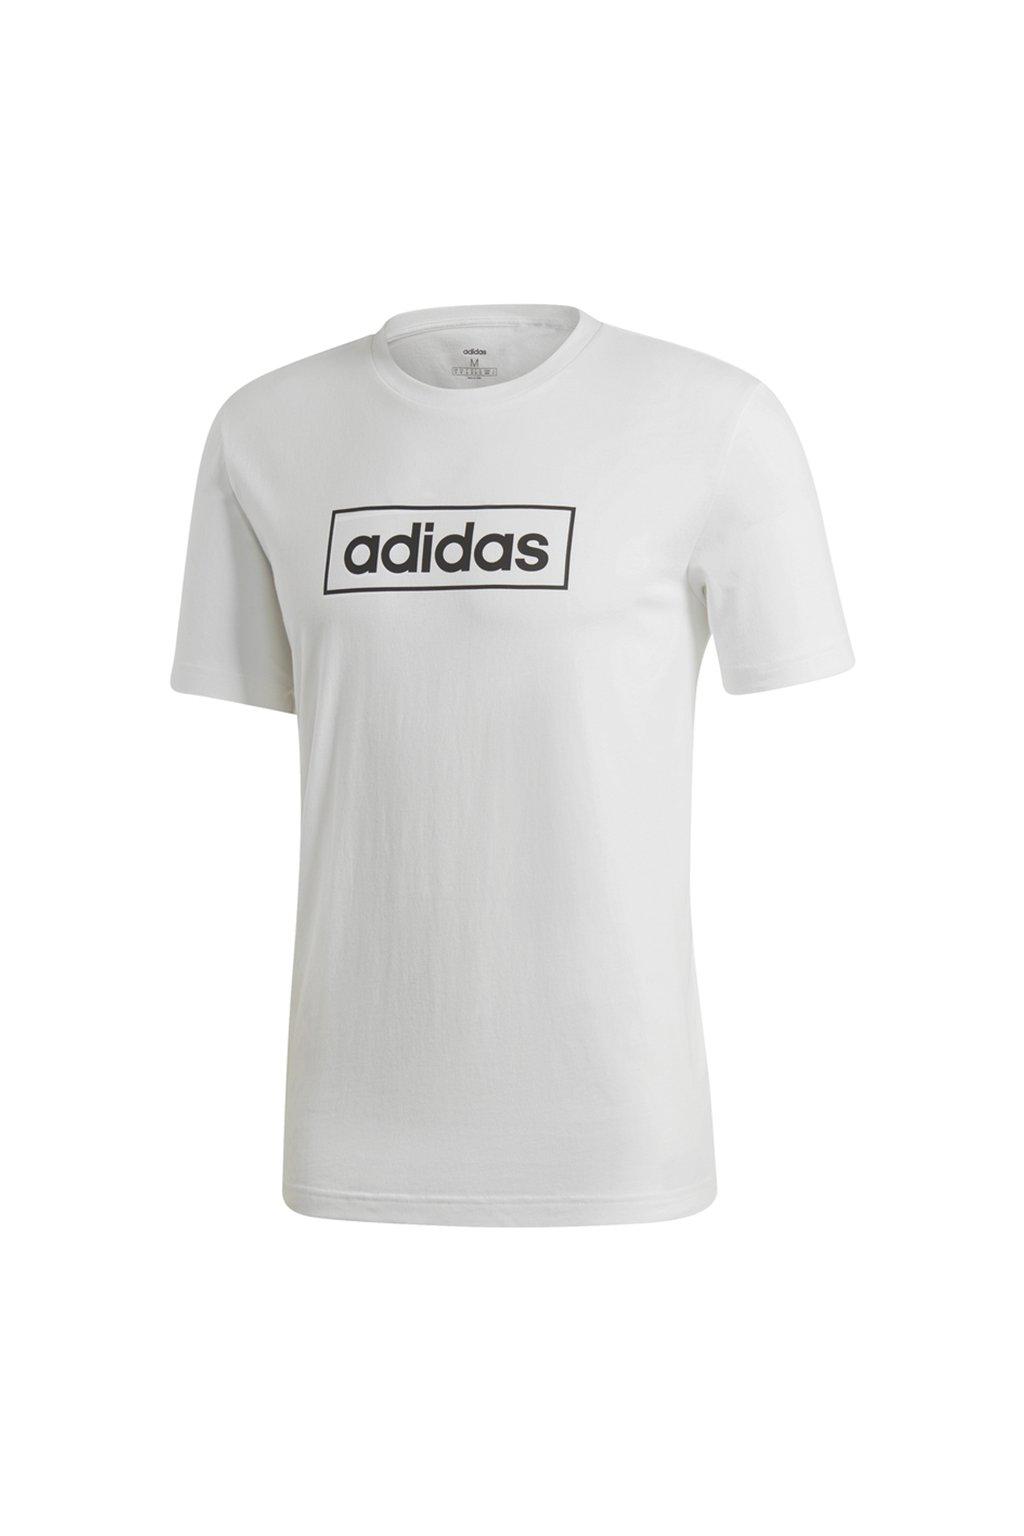 Adidas pánske tričko, EI4604